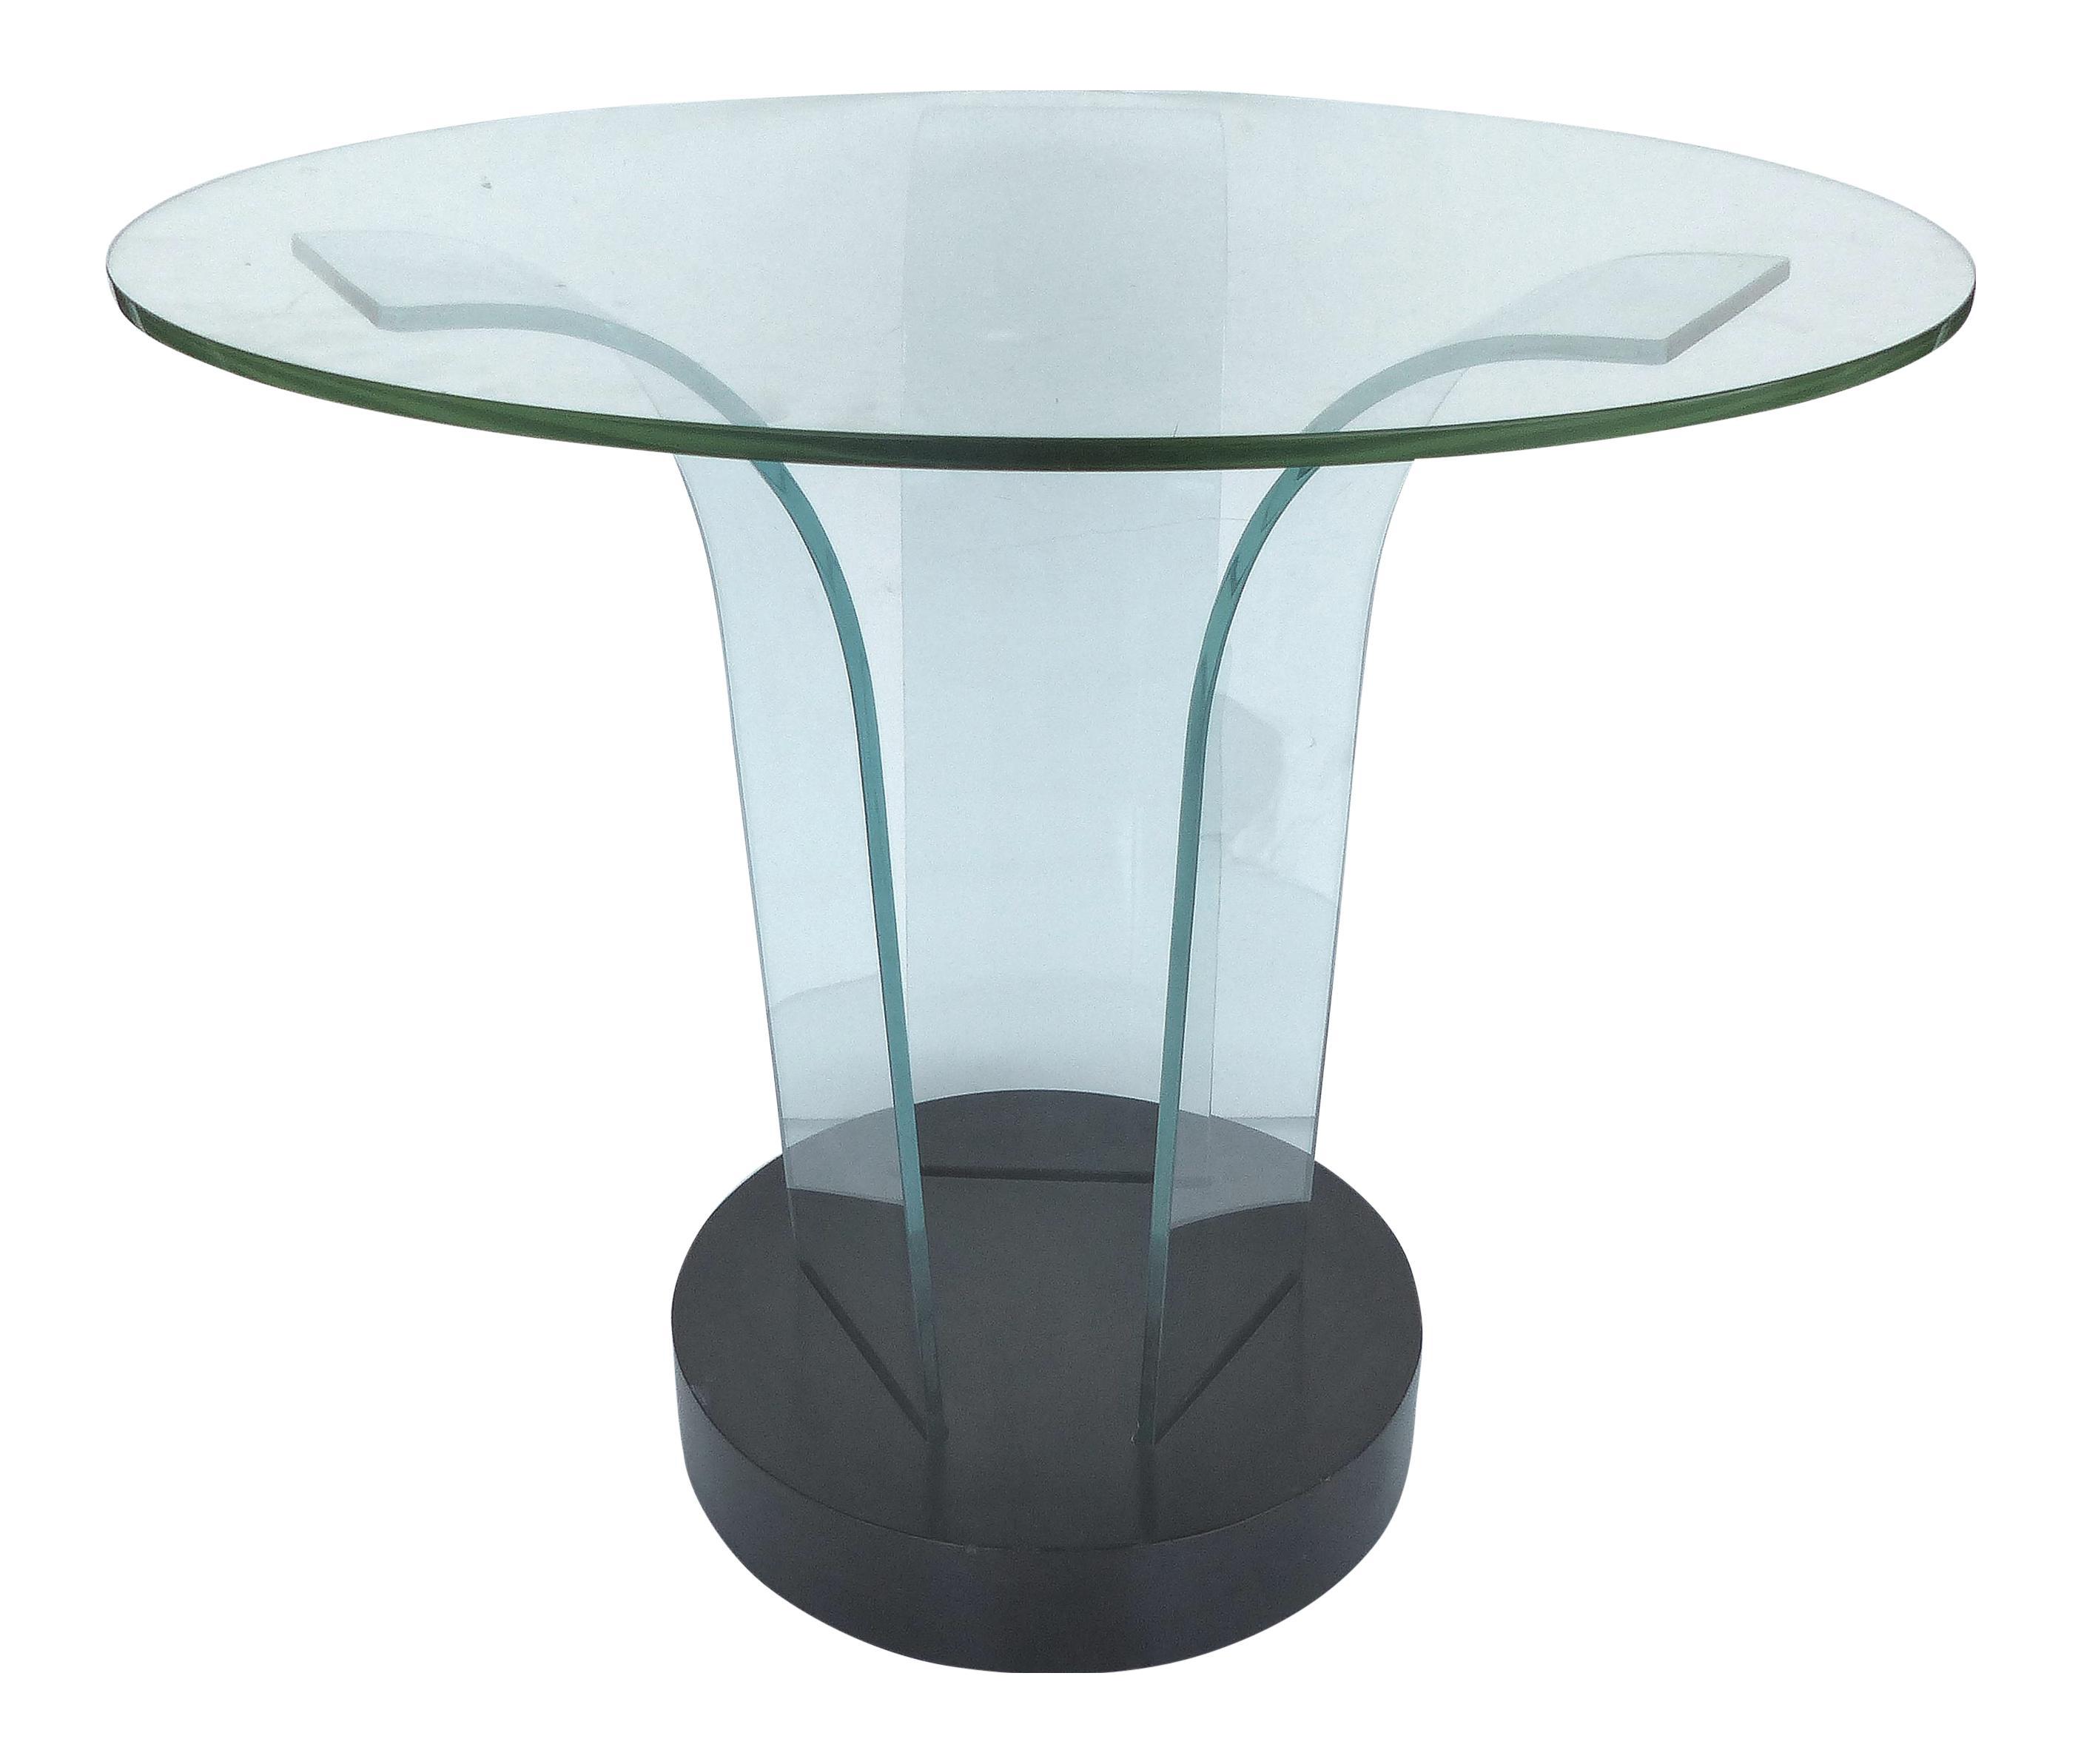 Incredible Mid Century Modern Modernage Bent Glass Side Table Mid Short Links Chair Design For Home Short Linksinfo